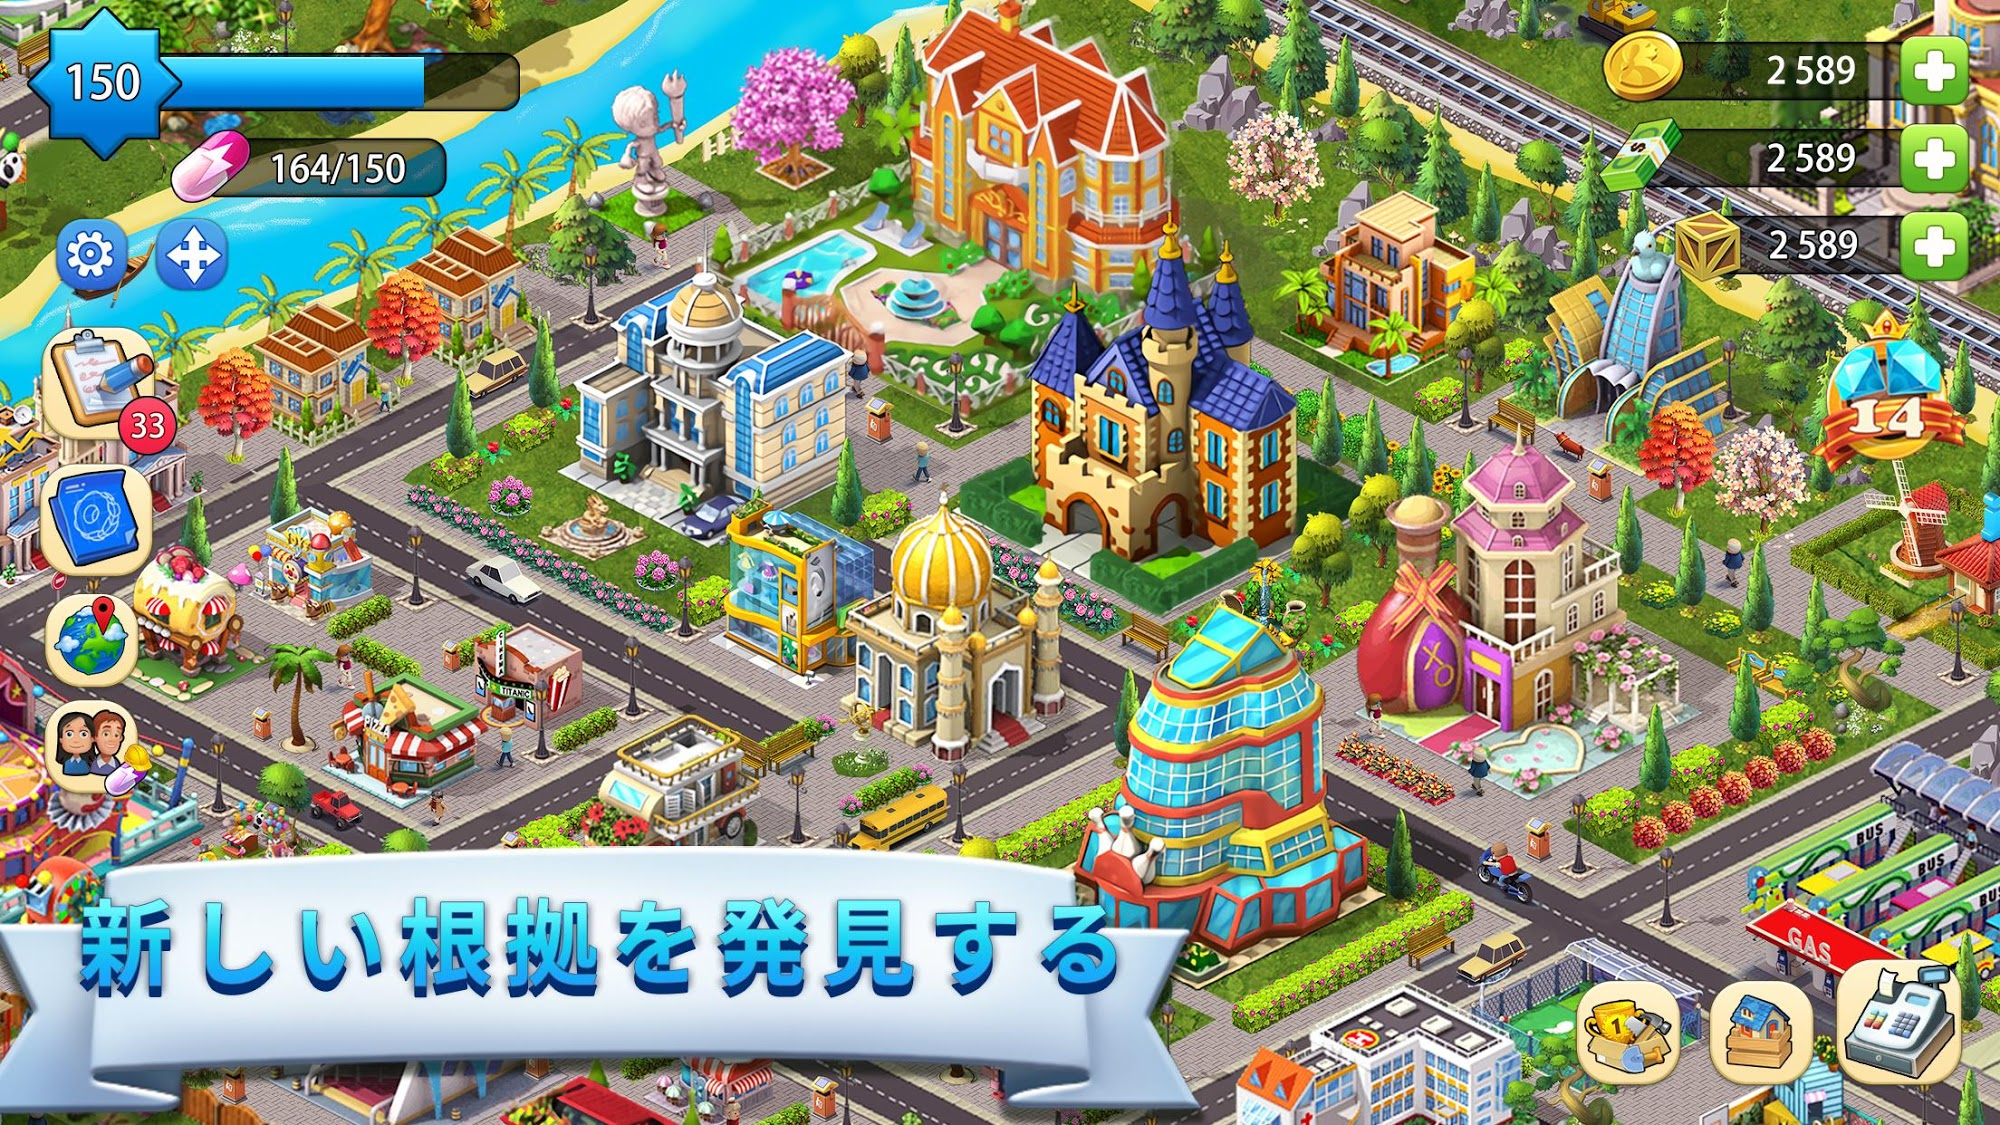 Lily City: Building metropolis スクリーンショット1